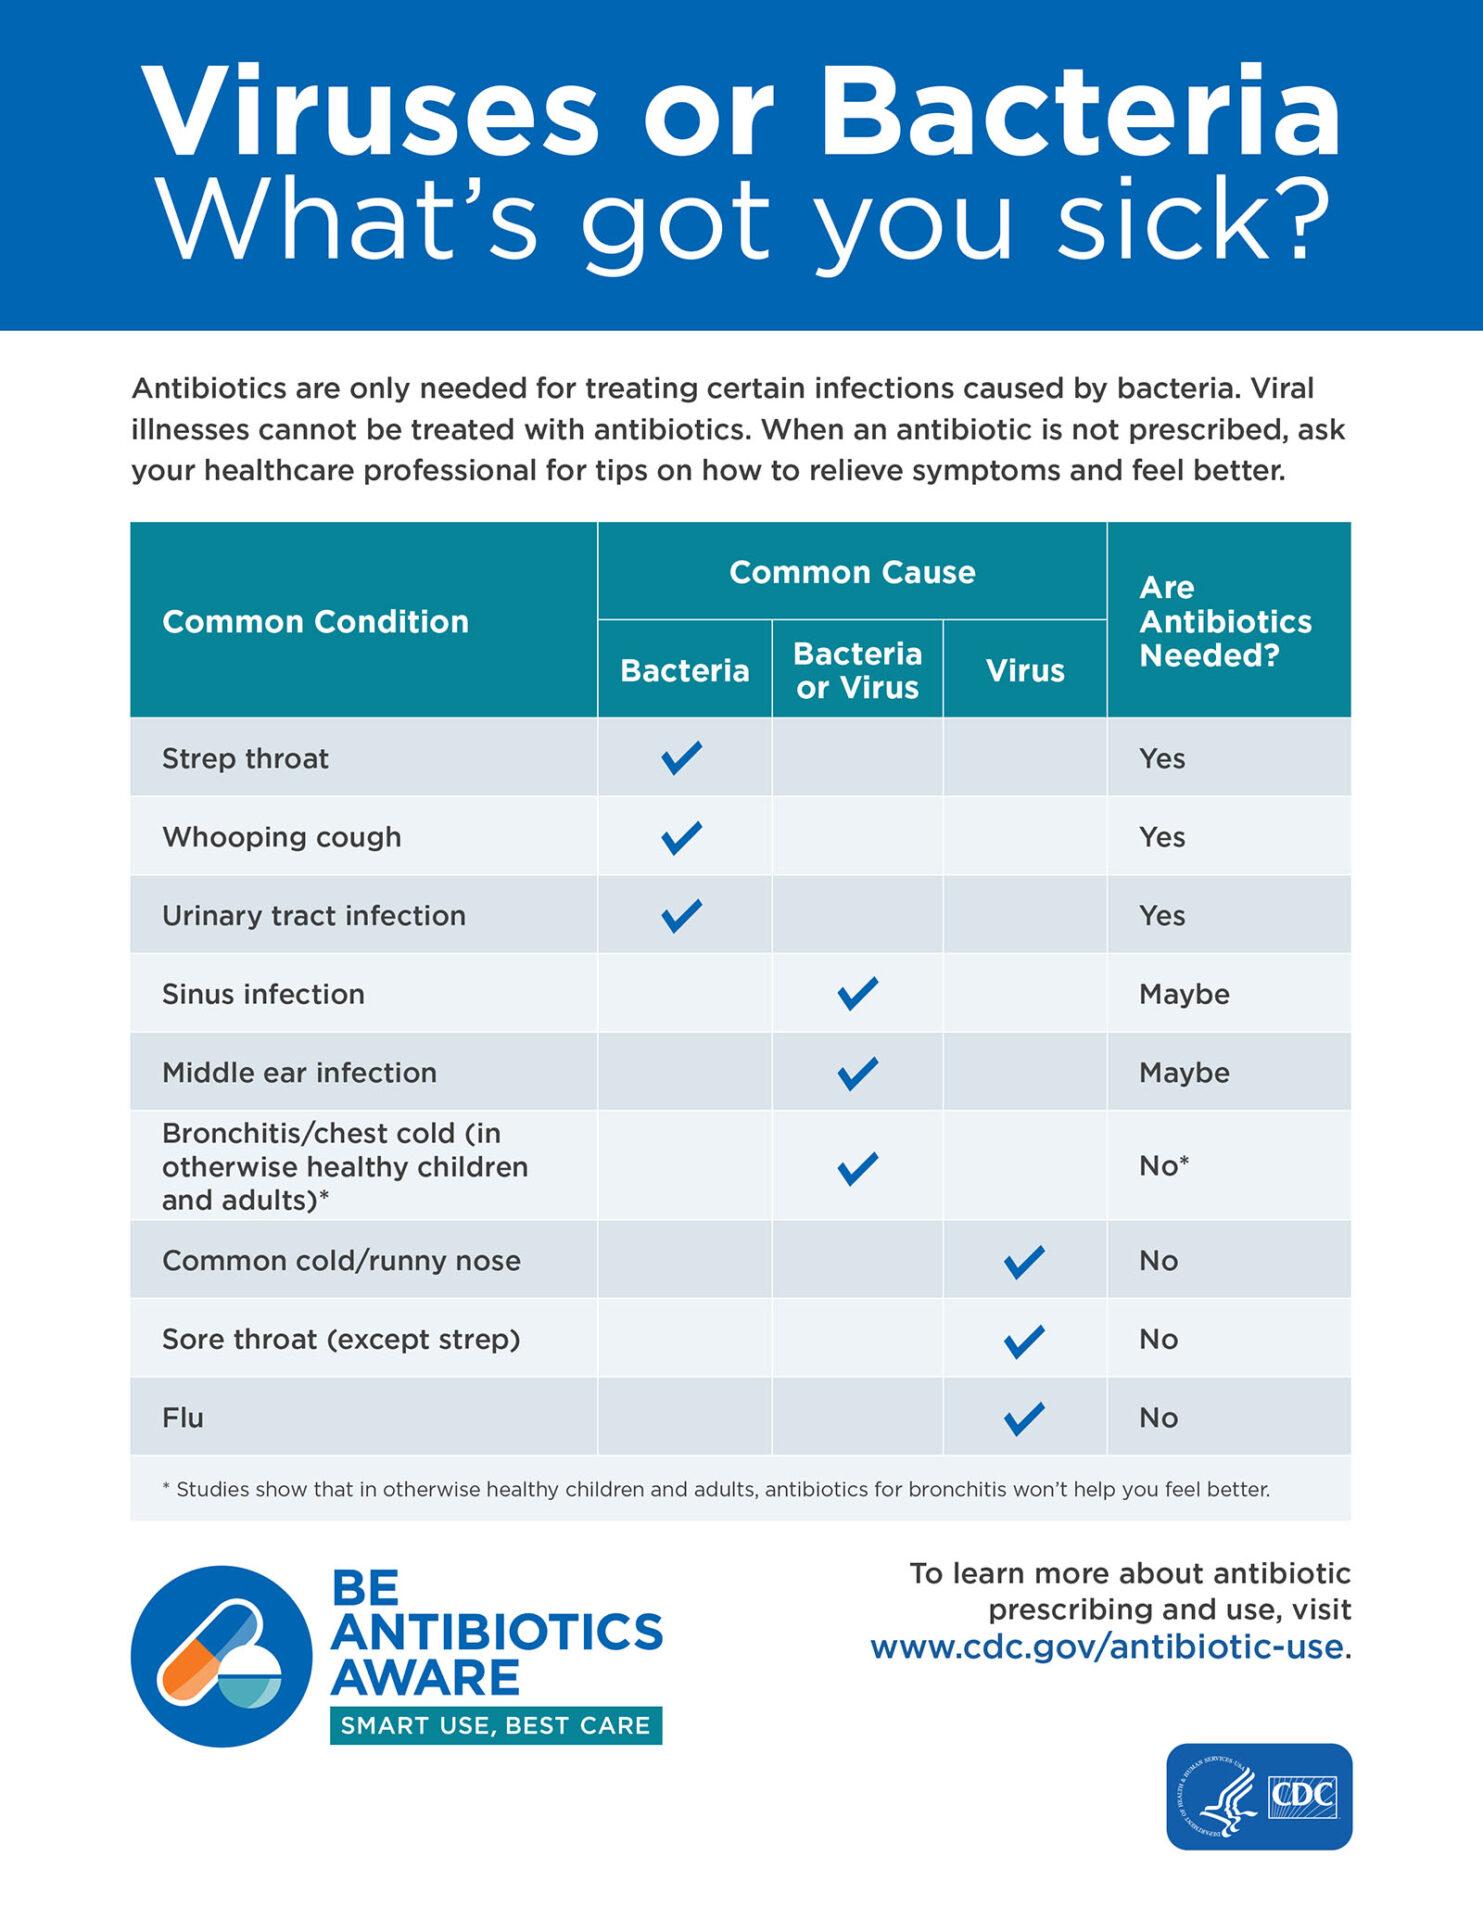 Be Antibiotics Aware, smart use, best care.